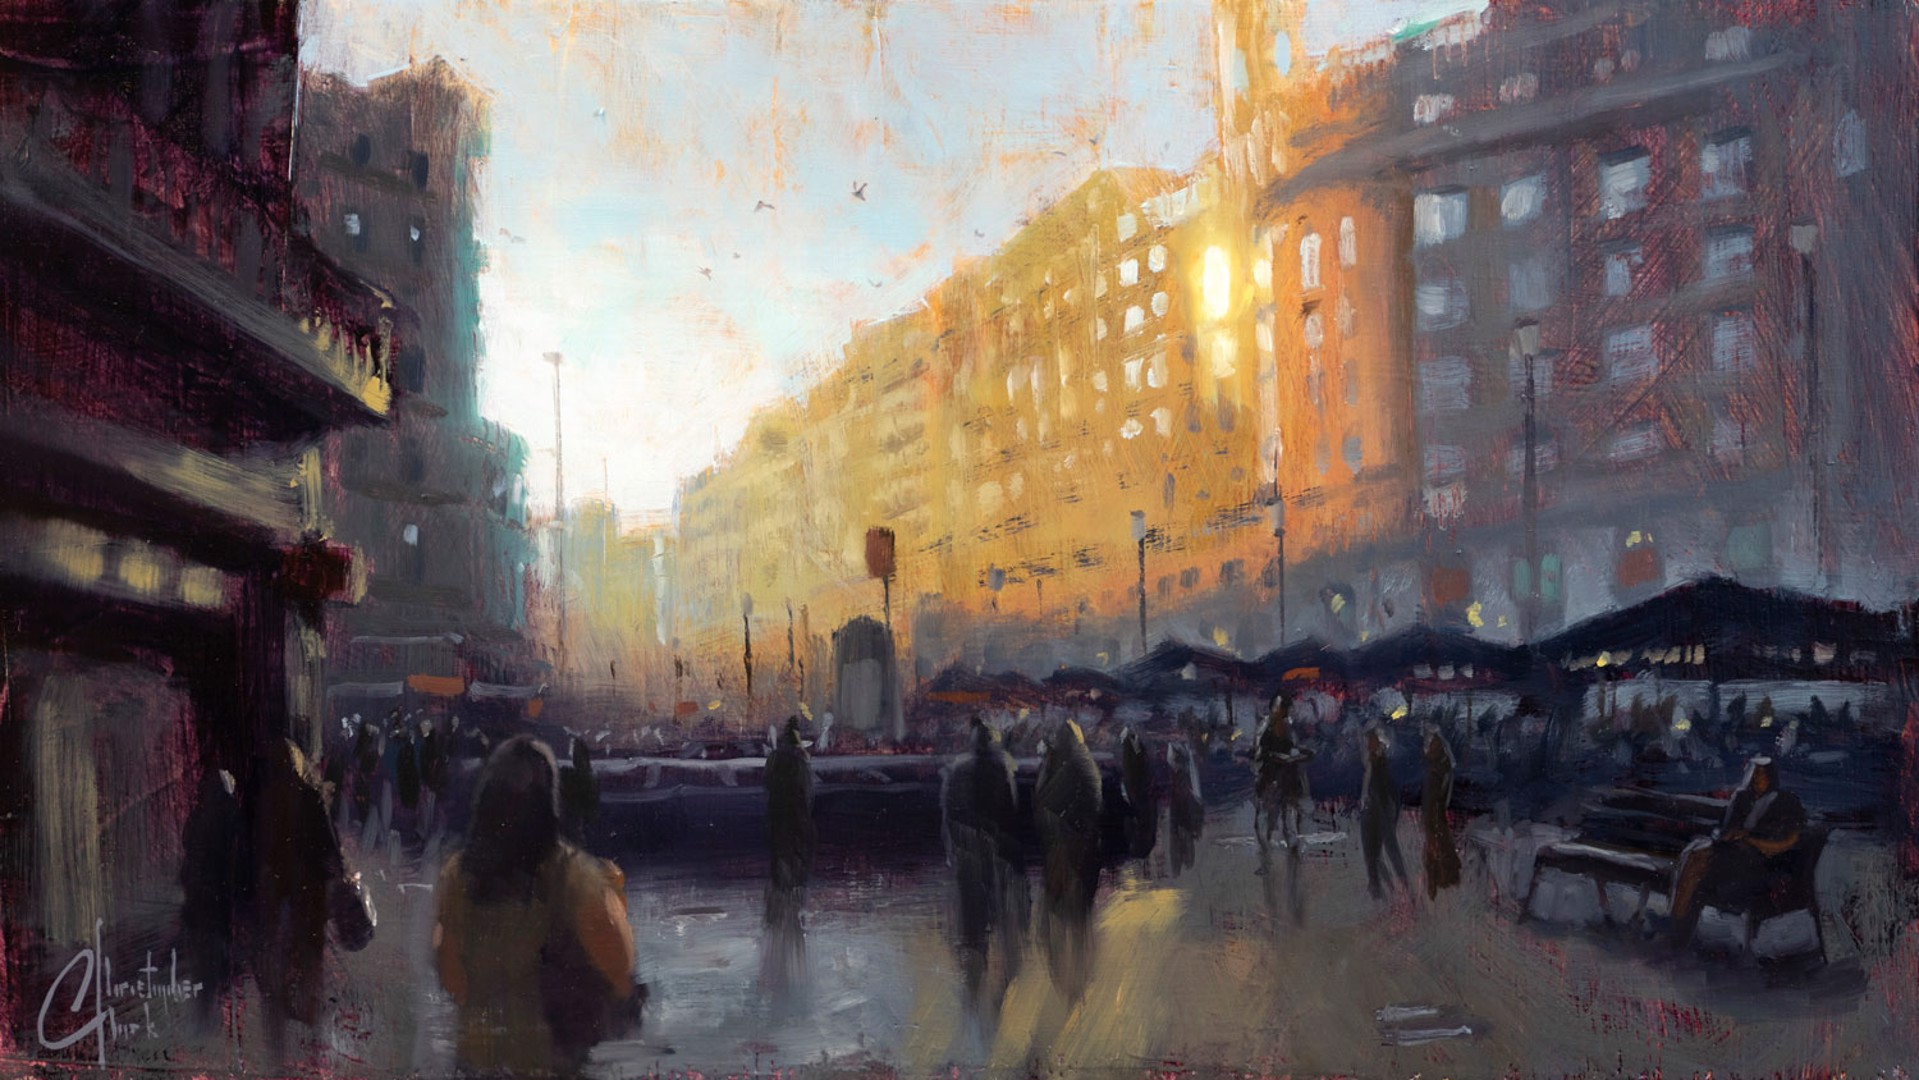 Barcelona Street by Christopher Clark